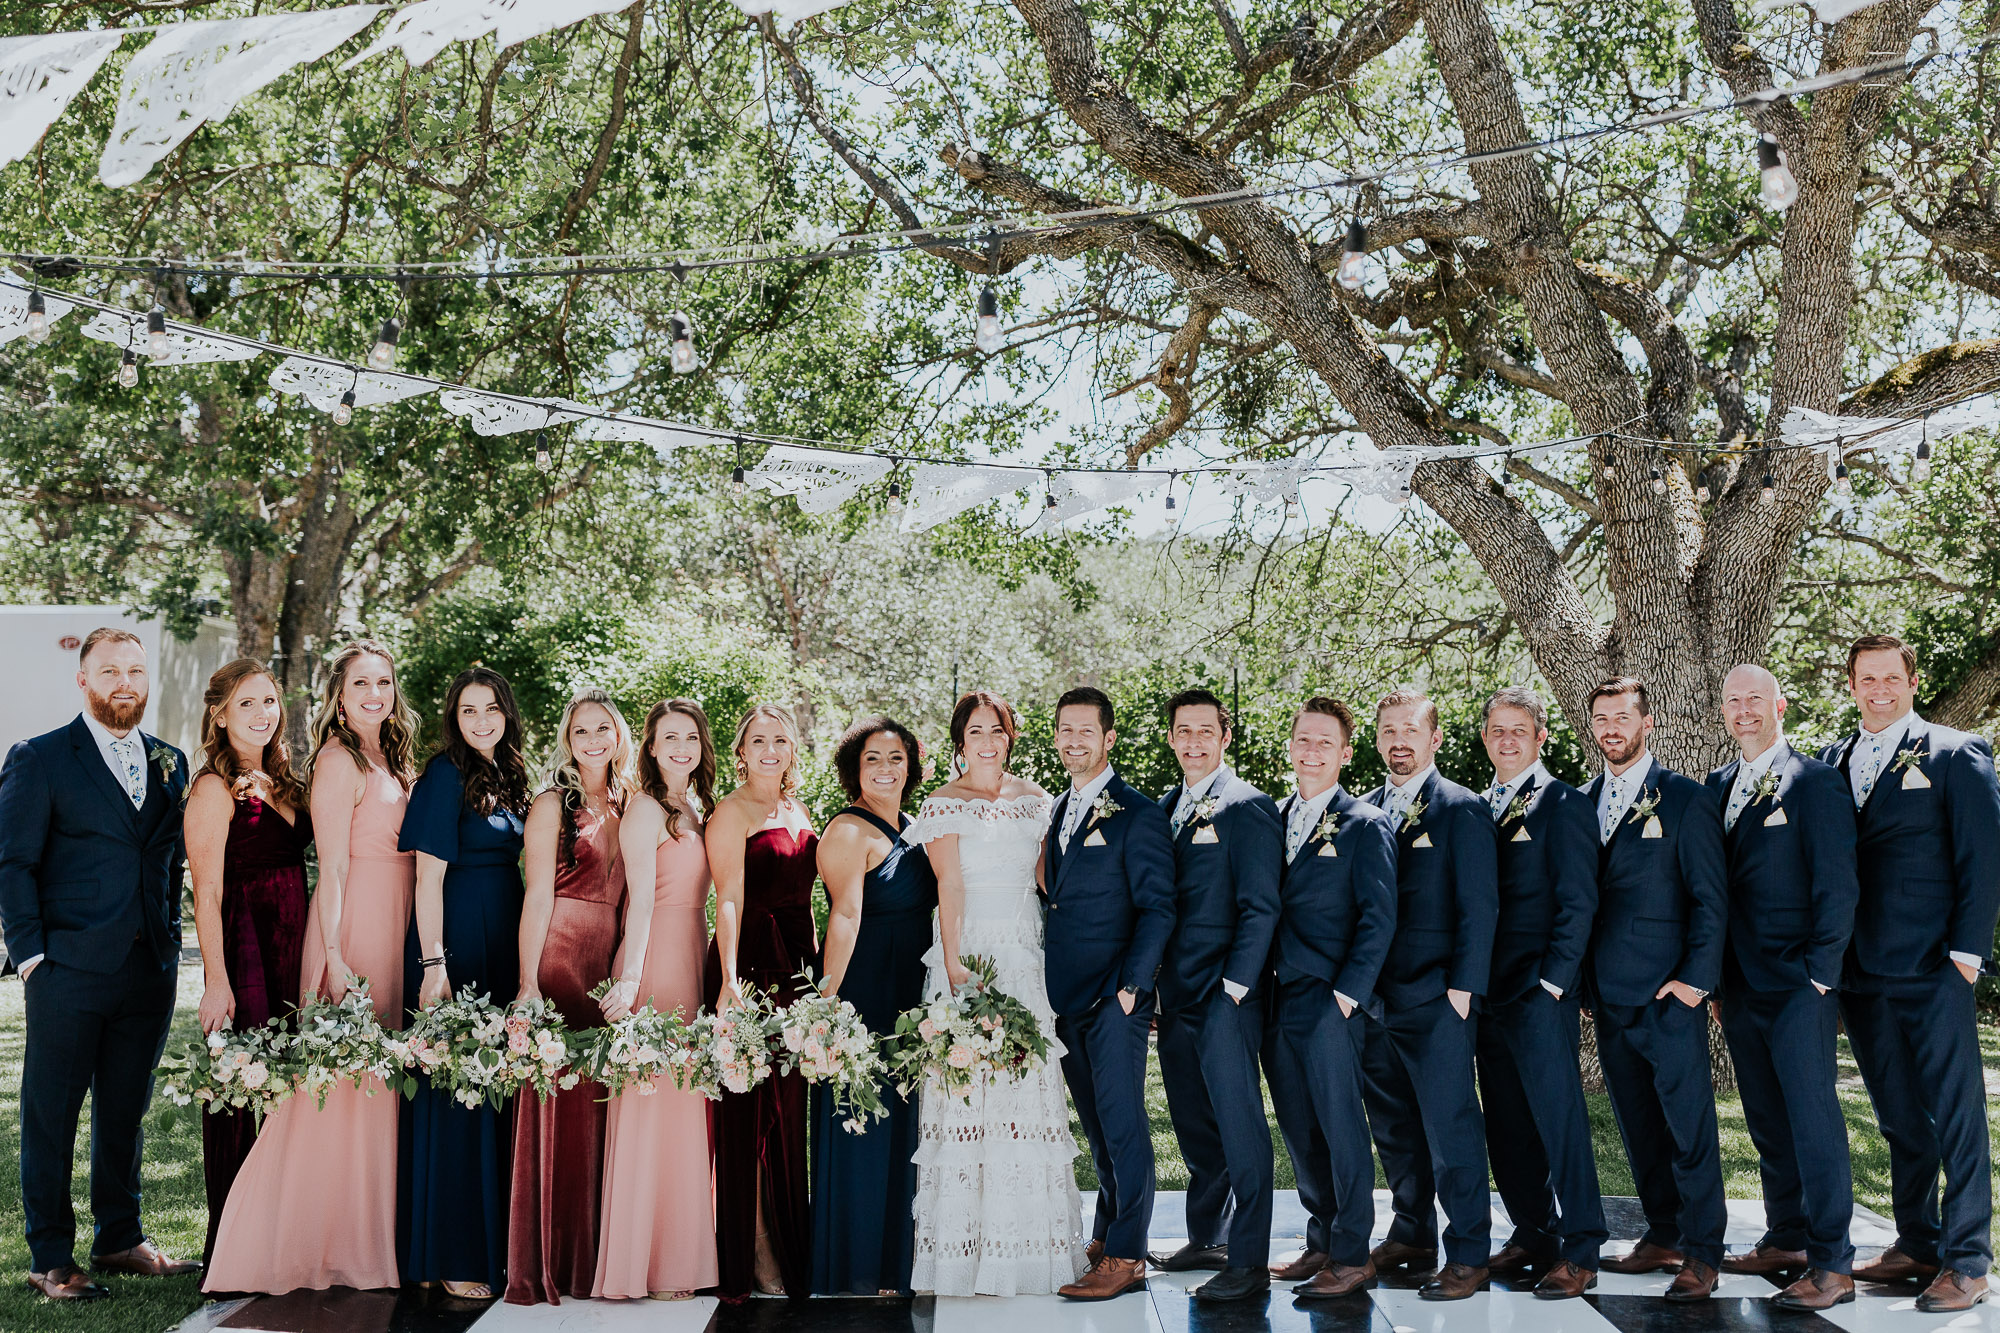 bridal party velvet bridesmaids dresses backyard wedding